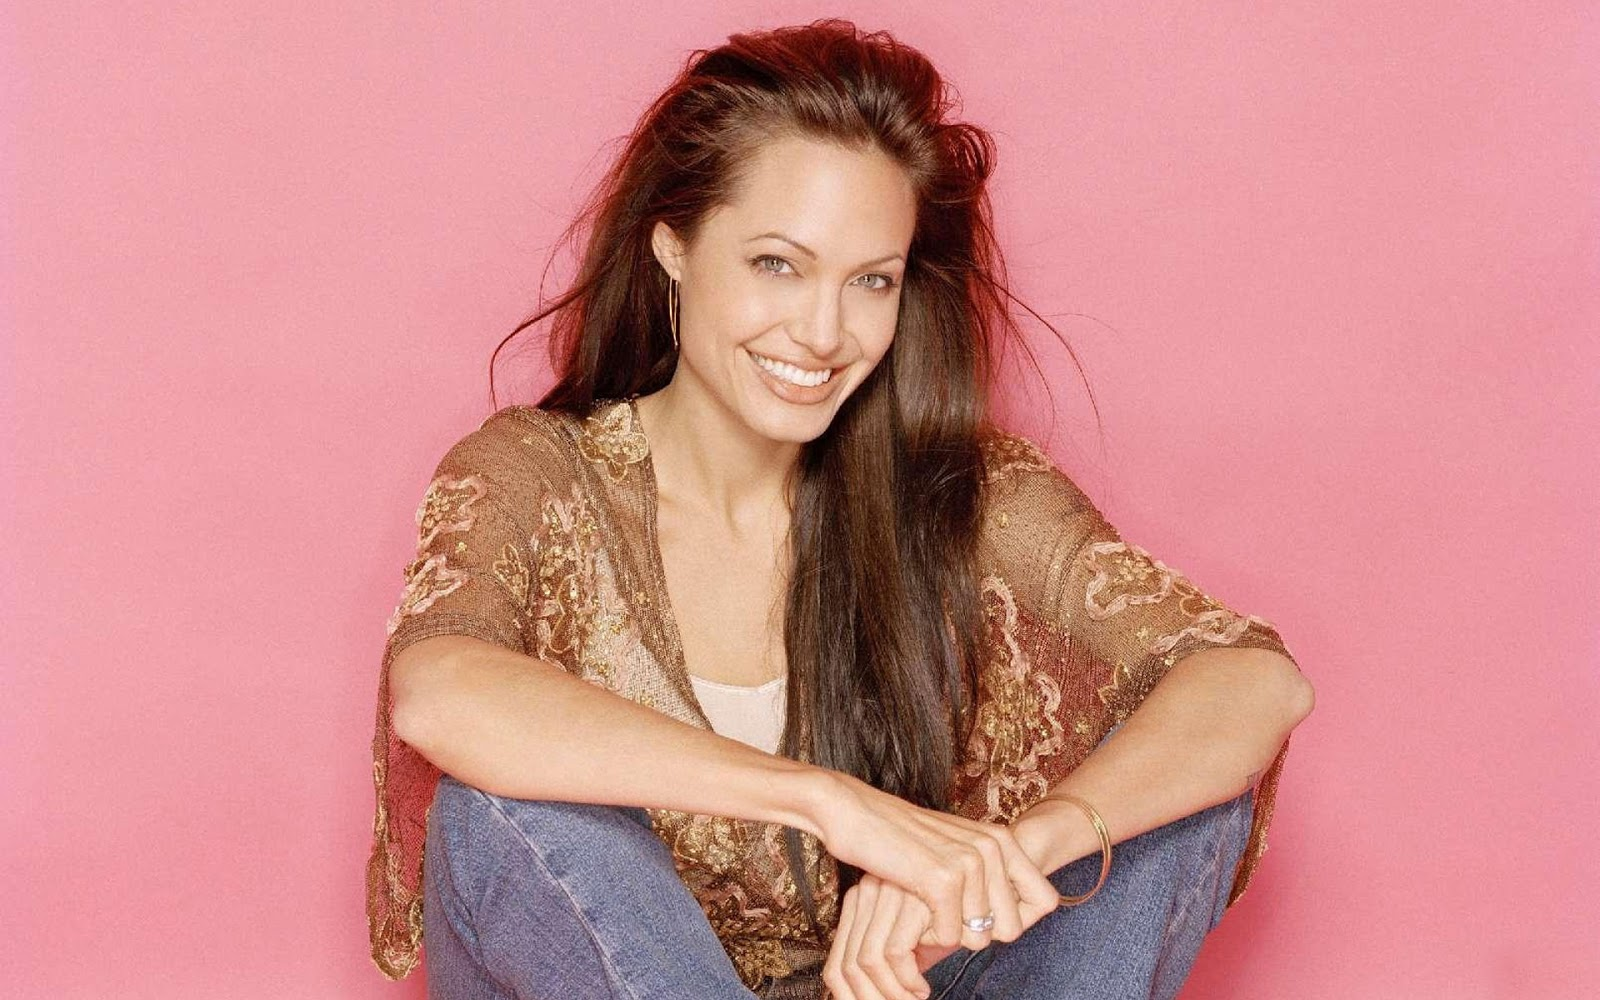 Angelina Jolie Hd Wallpapers: Angelina Jolie